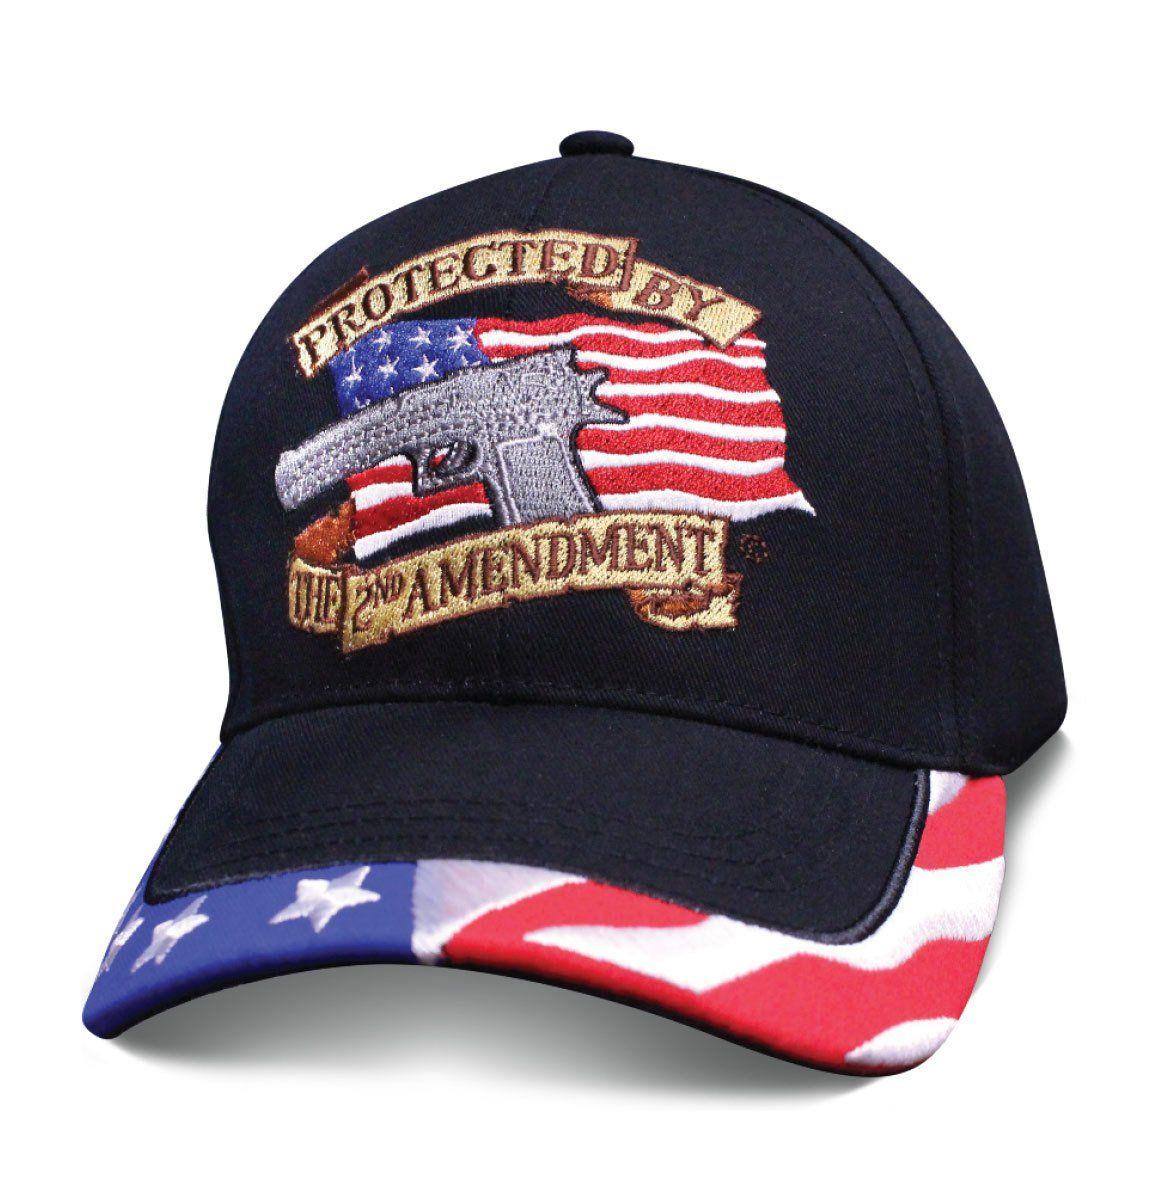 23871d7b5 Patriotic Mens Hat PROTECTED BY THE 2ND AMENDMENT American Flag Cap ...